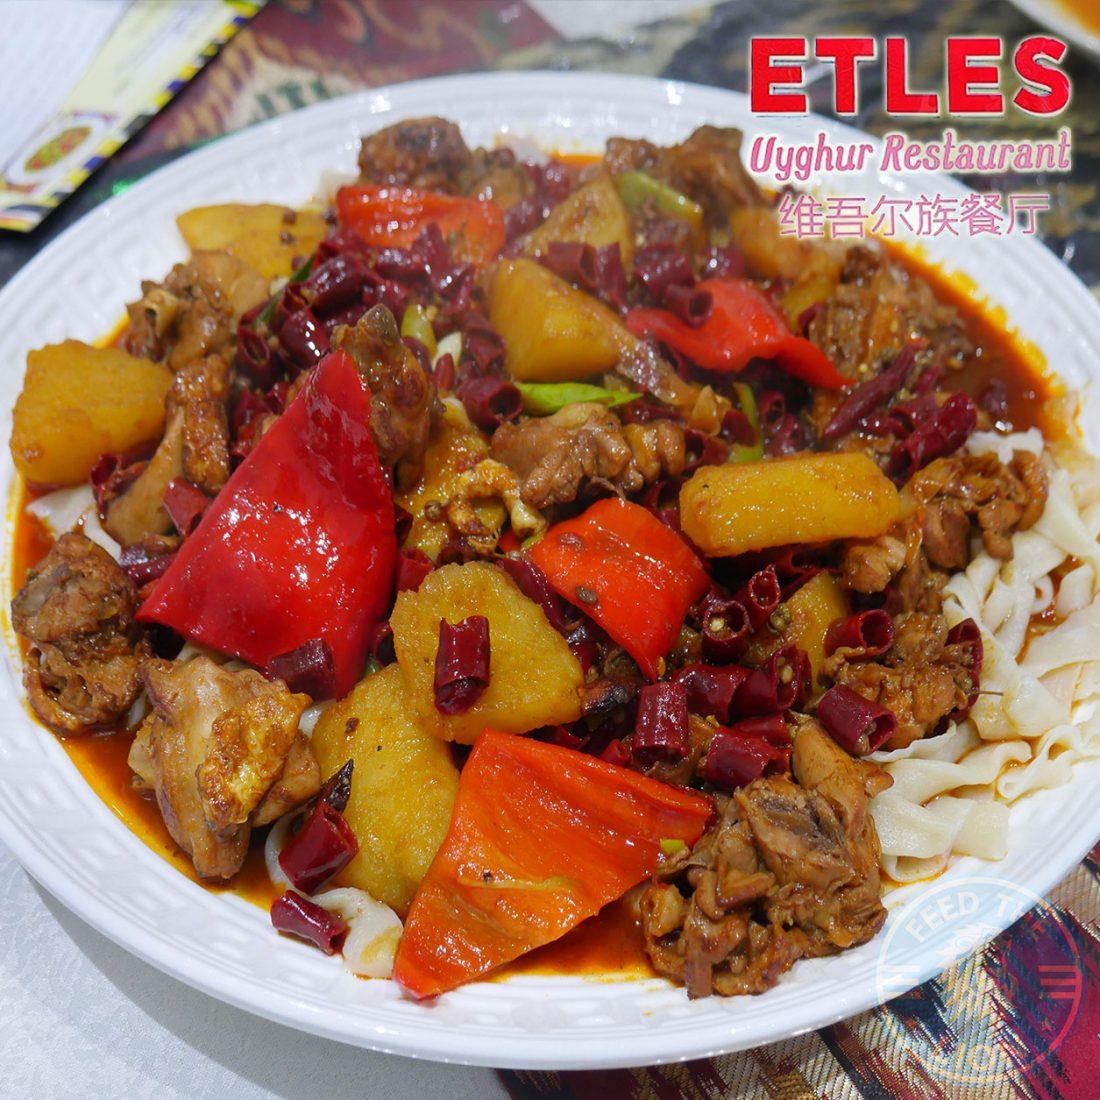 Etles (Uyghur) - Walthamstow, London - Feed the Lion